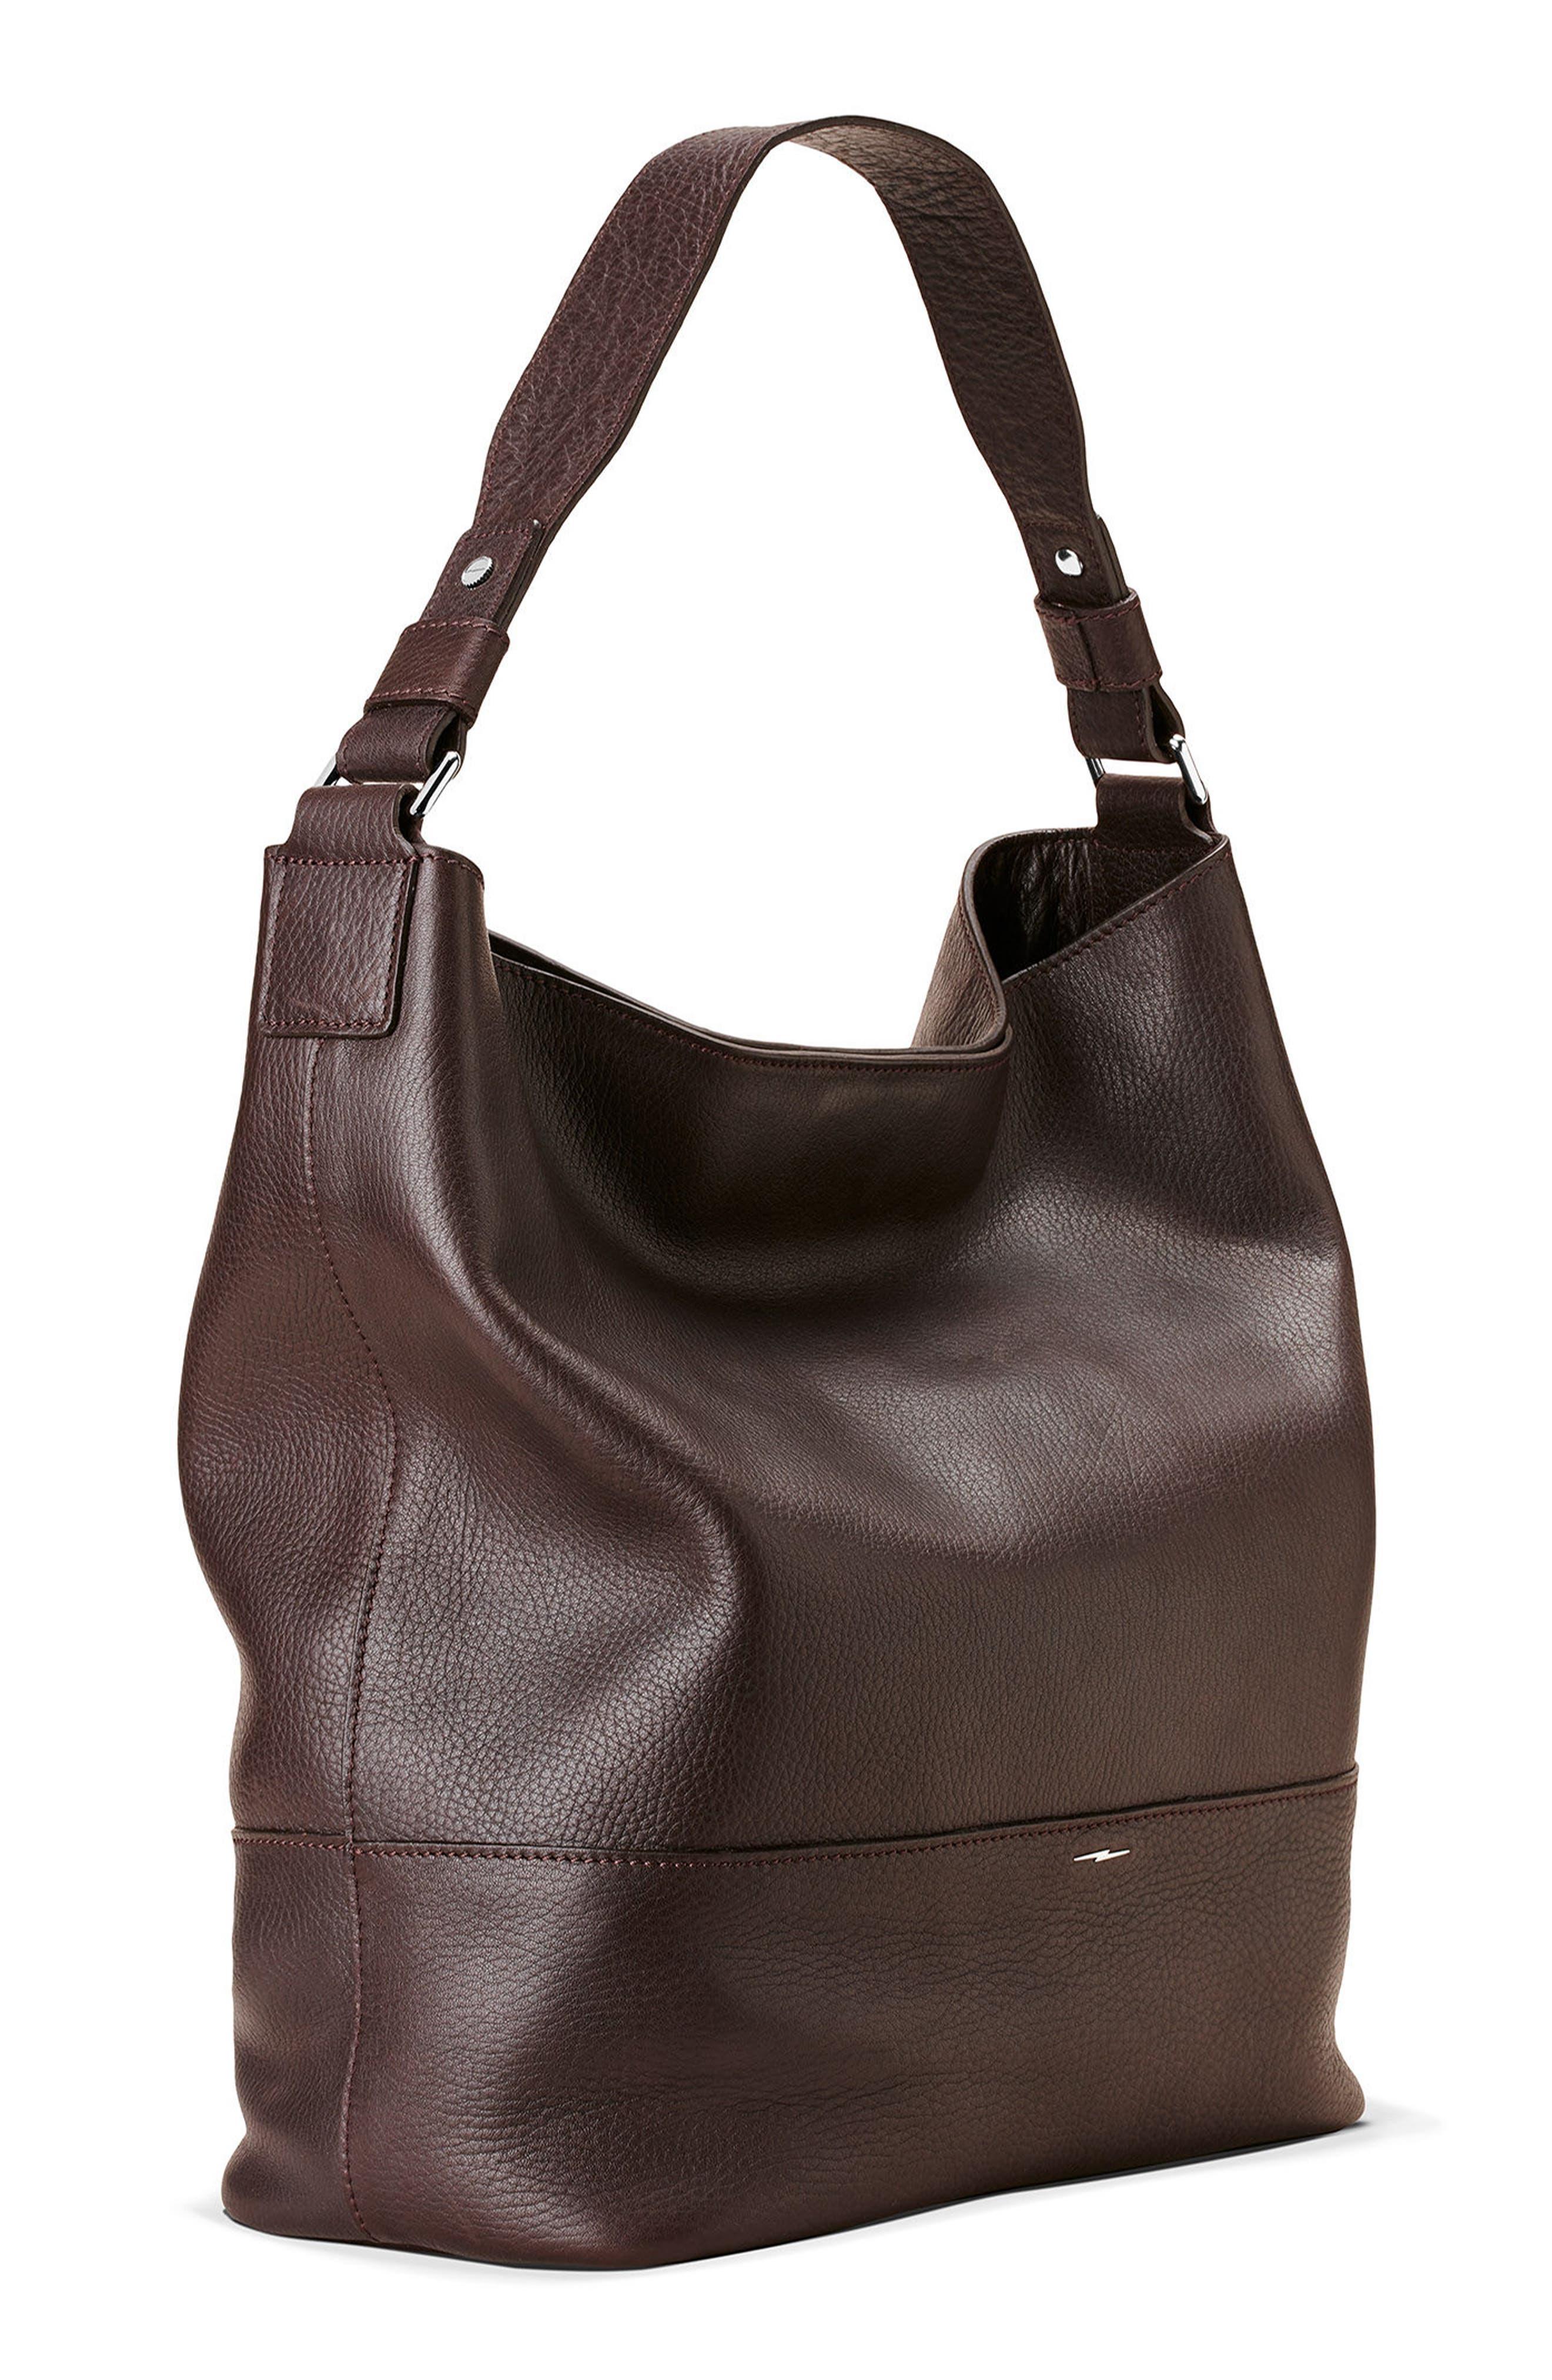 SHINOLA,                             Relaxed Calfskin Leather Hobo Bag,                             Alternate thumbnail 8, color,                             240